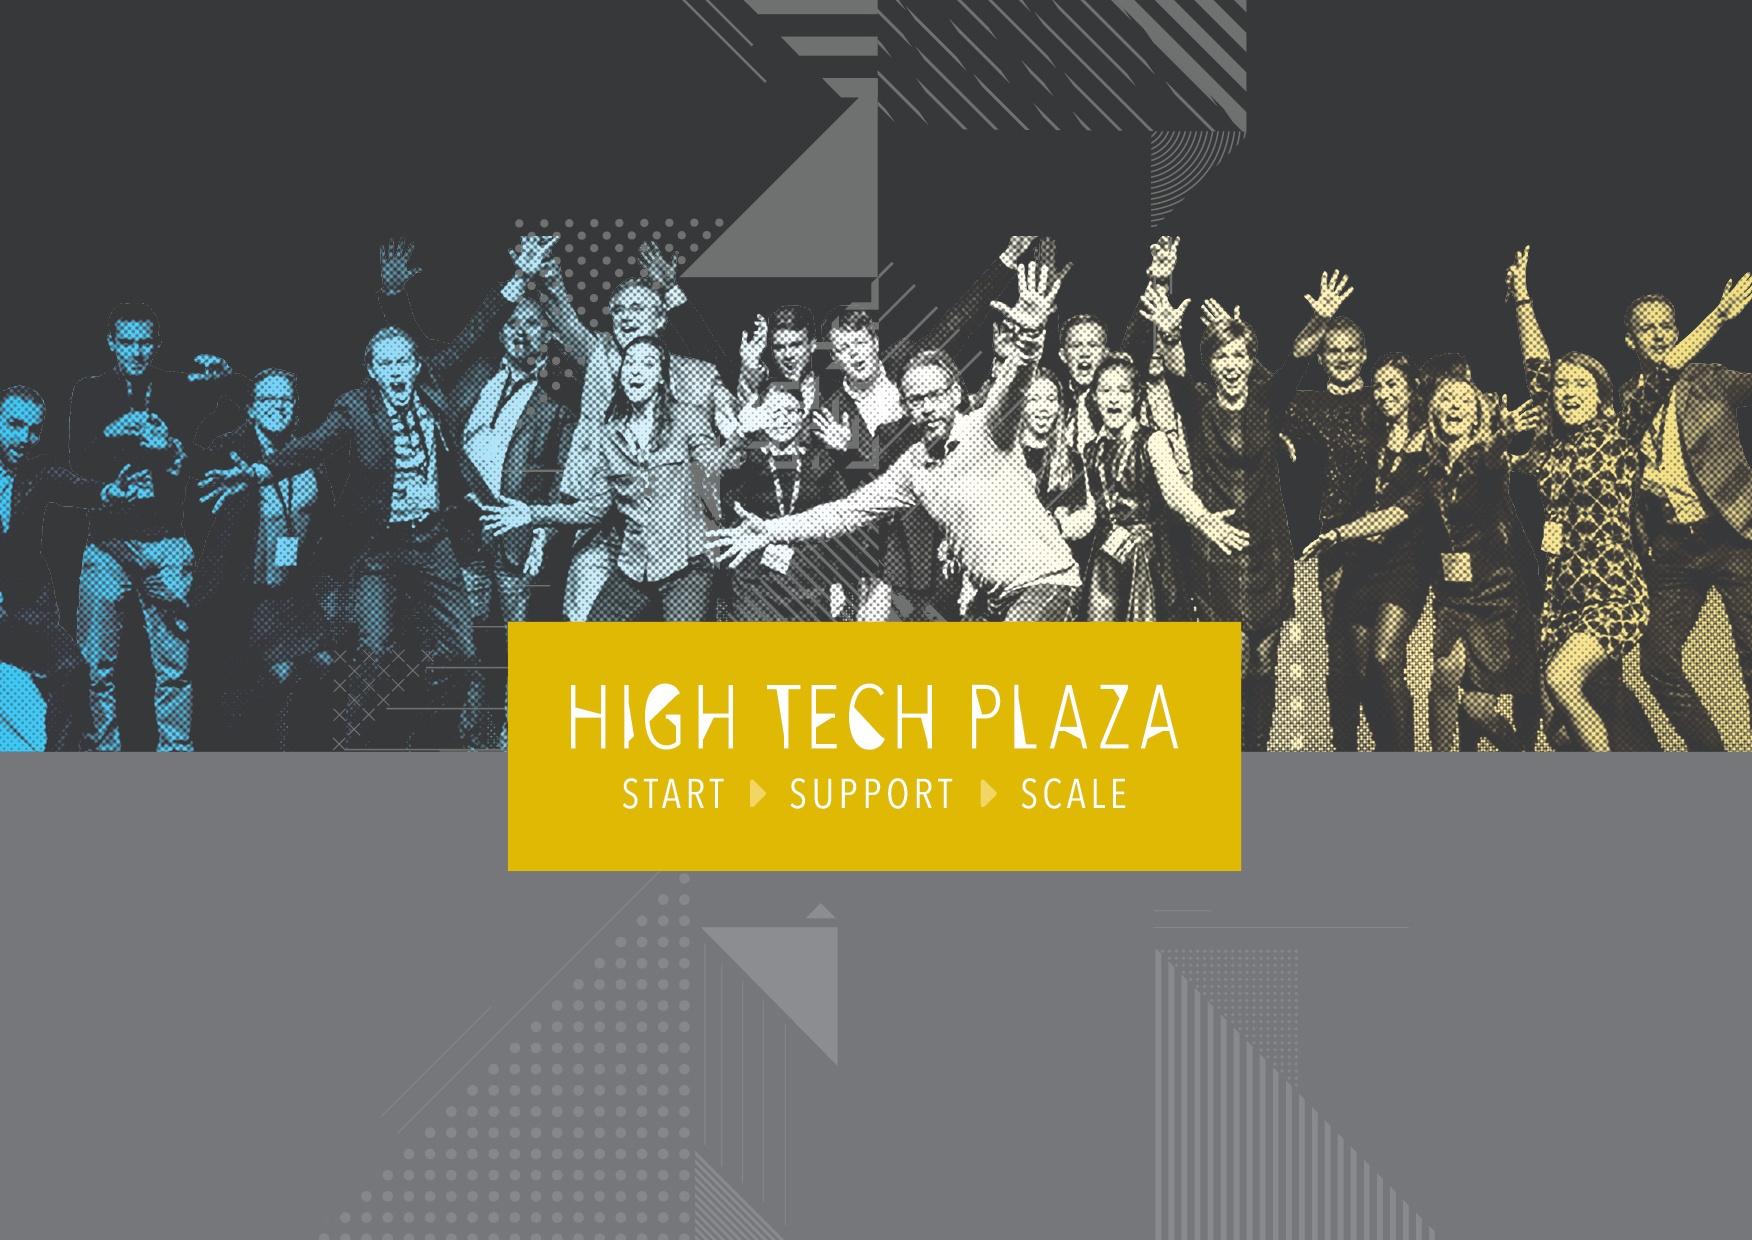 high tech plaza logo header